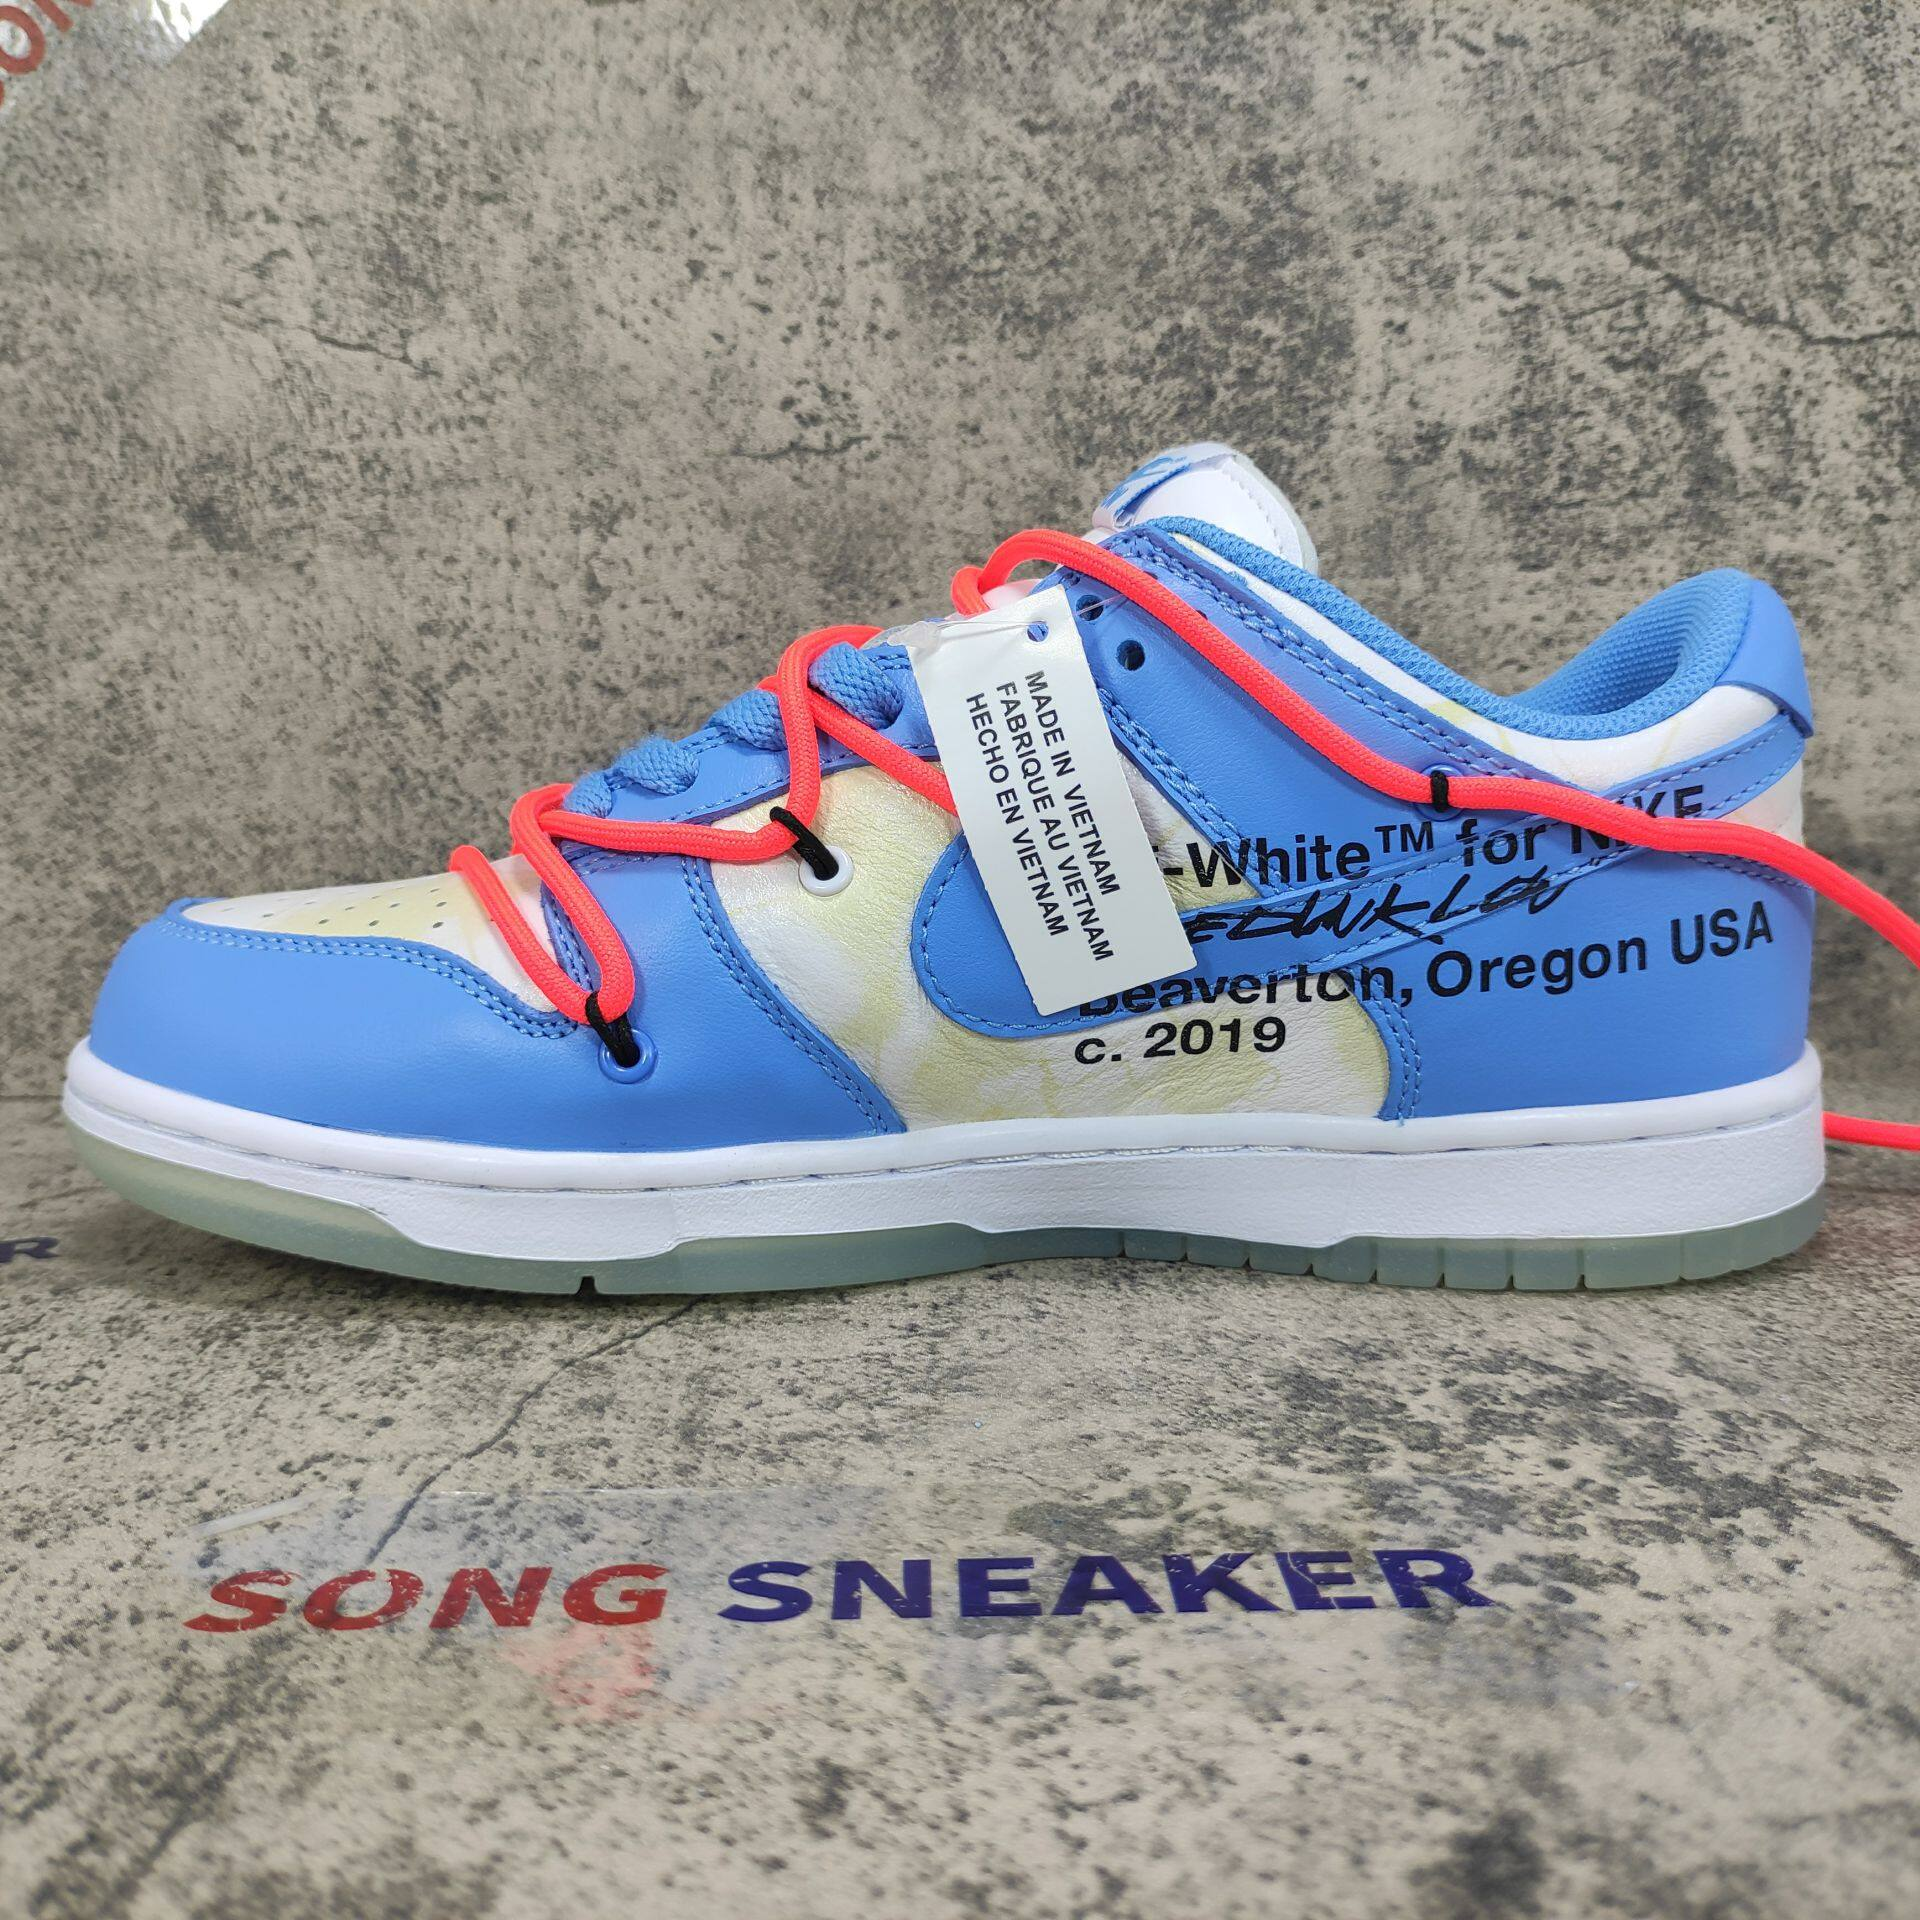 Nike SB Dunk Low UNC x OFF White x Futura